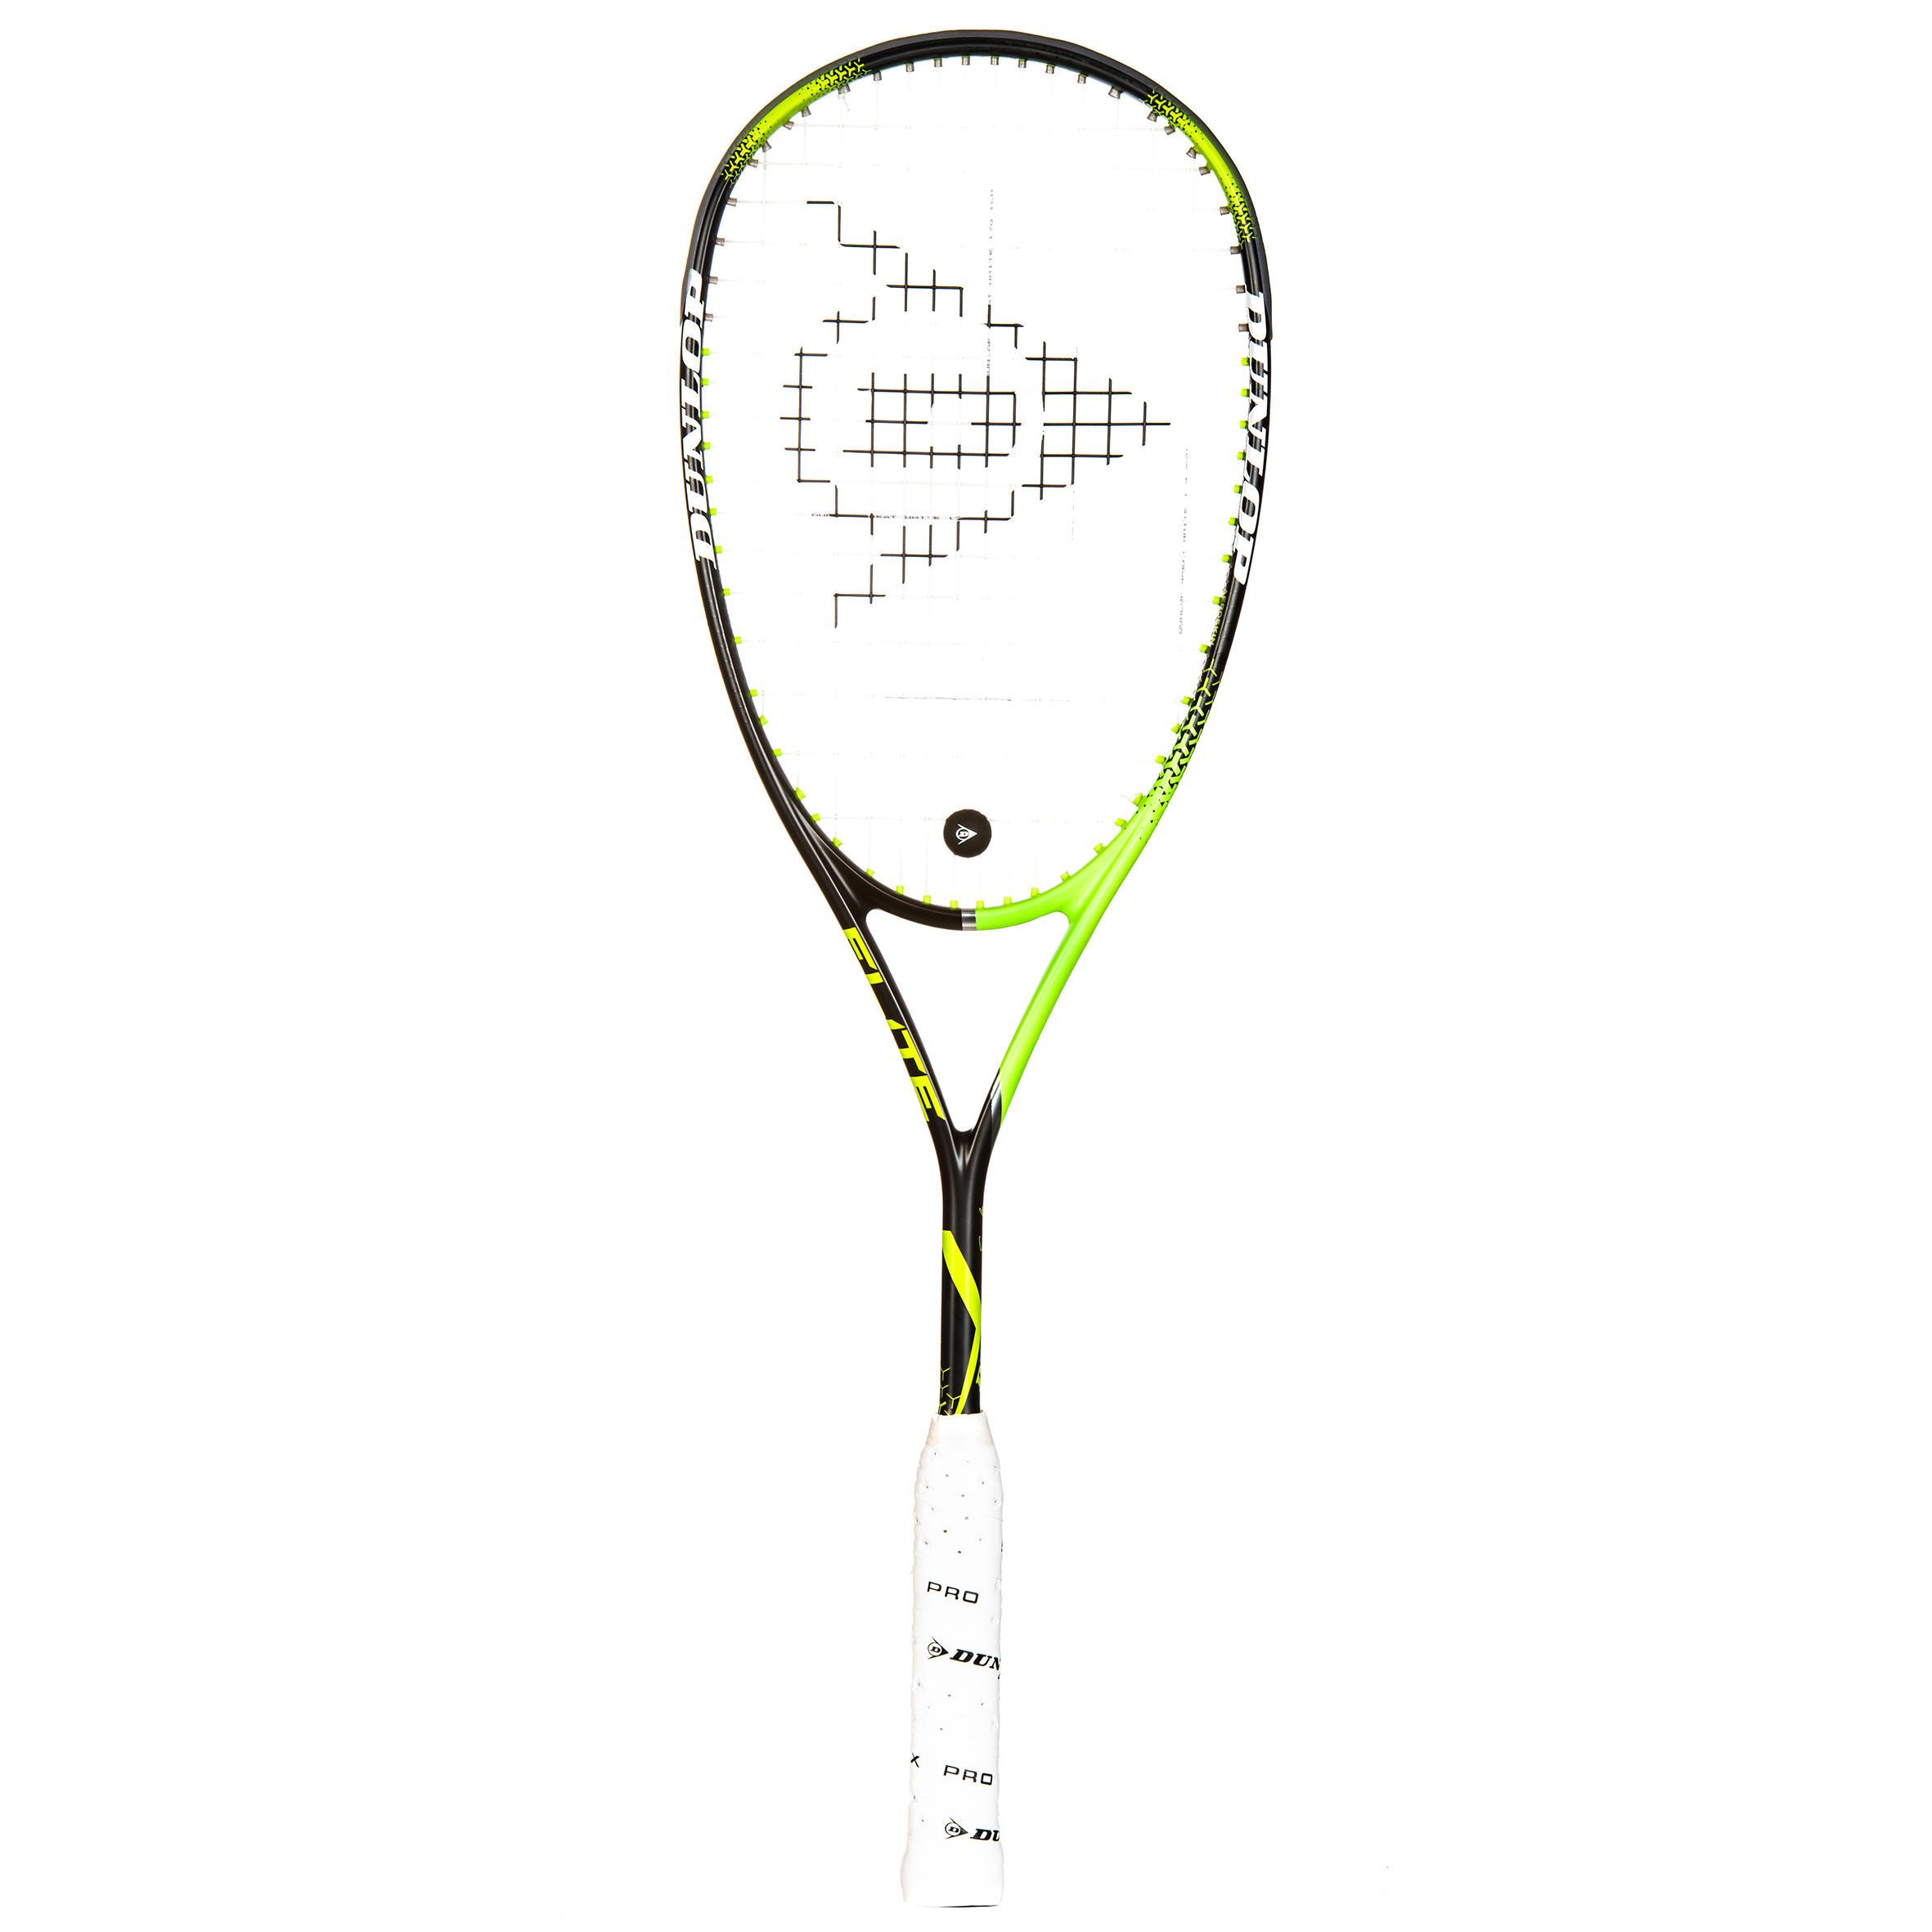 Dunlop Pro 3 unidades Pelotas de squash